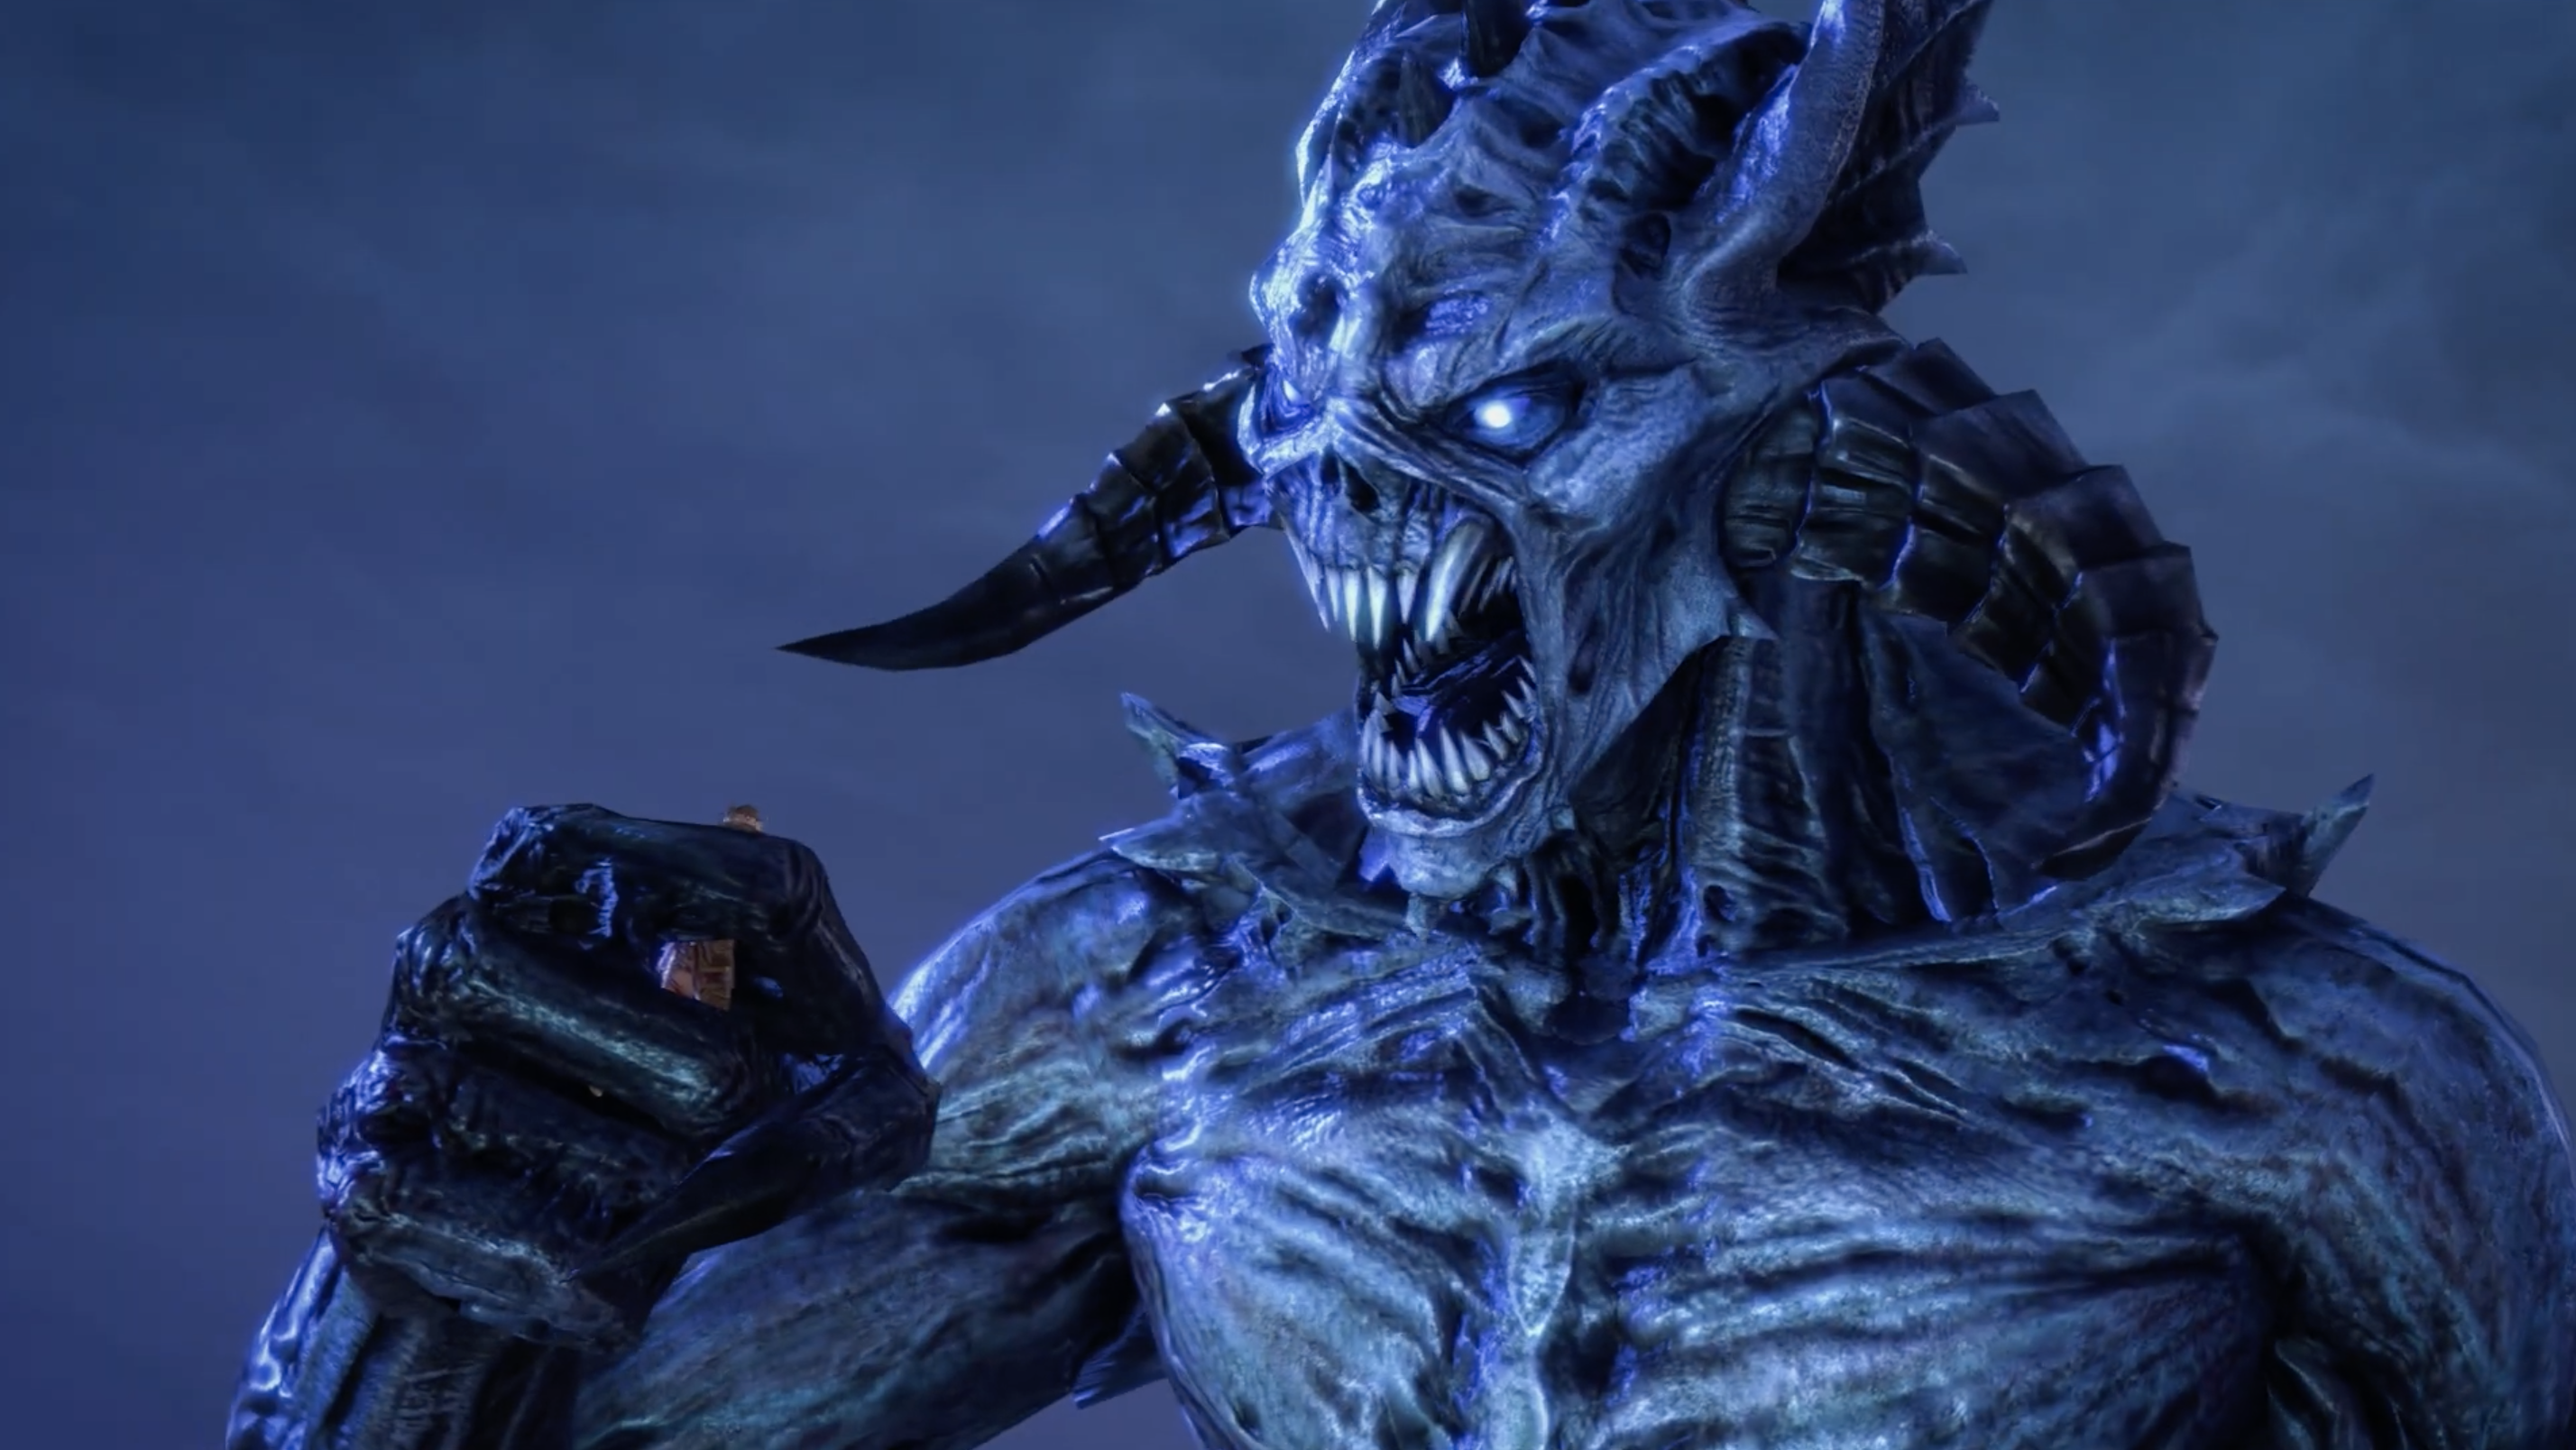 E3 2021: The Elder Scrolls Online Gets Enhanced for Xbox Series X|S